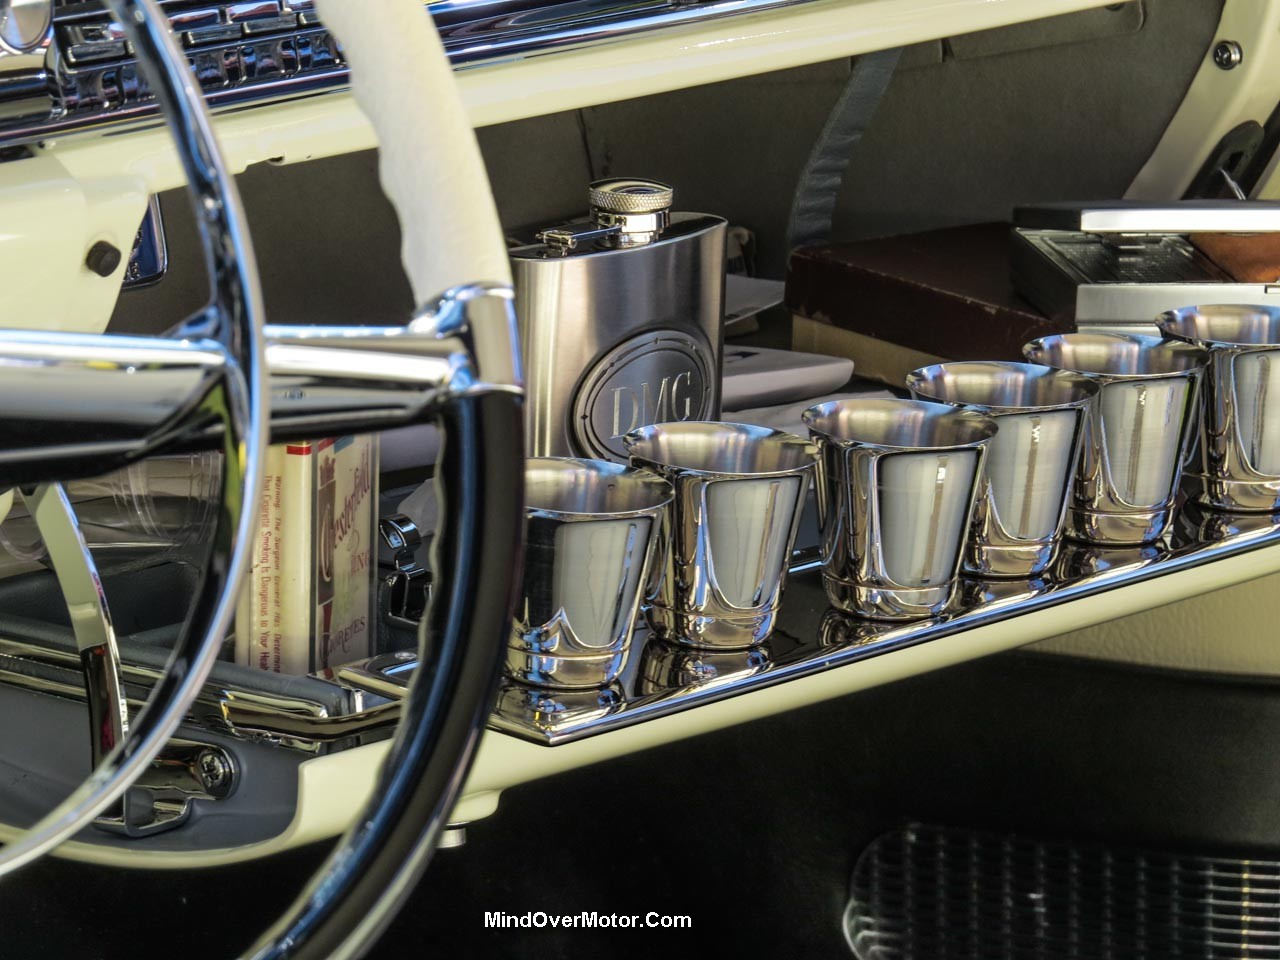 1957 Cadillac Eldorado Brougham Glasses